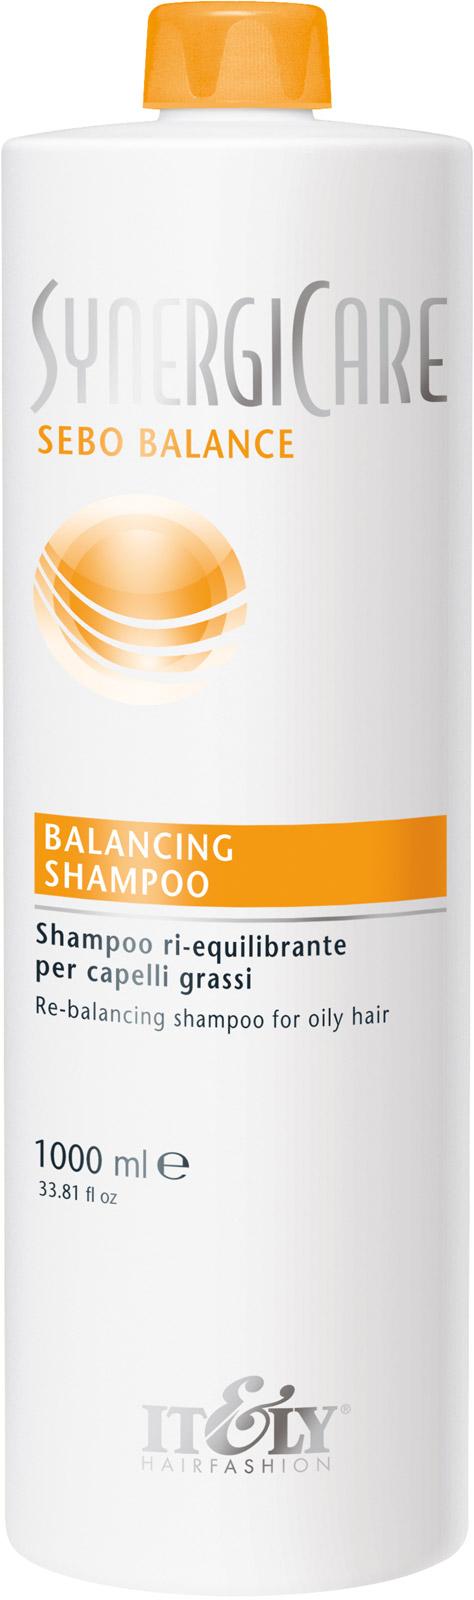 Шампунь для волос Itely Hairfashion балансирующий для жирной кожи головы BALANCING SHAMPOO 1000 ml